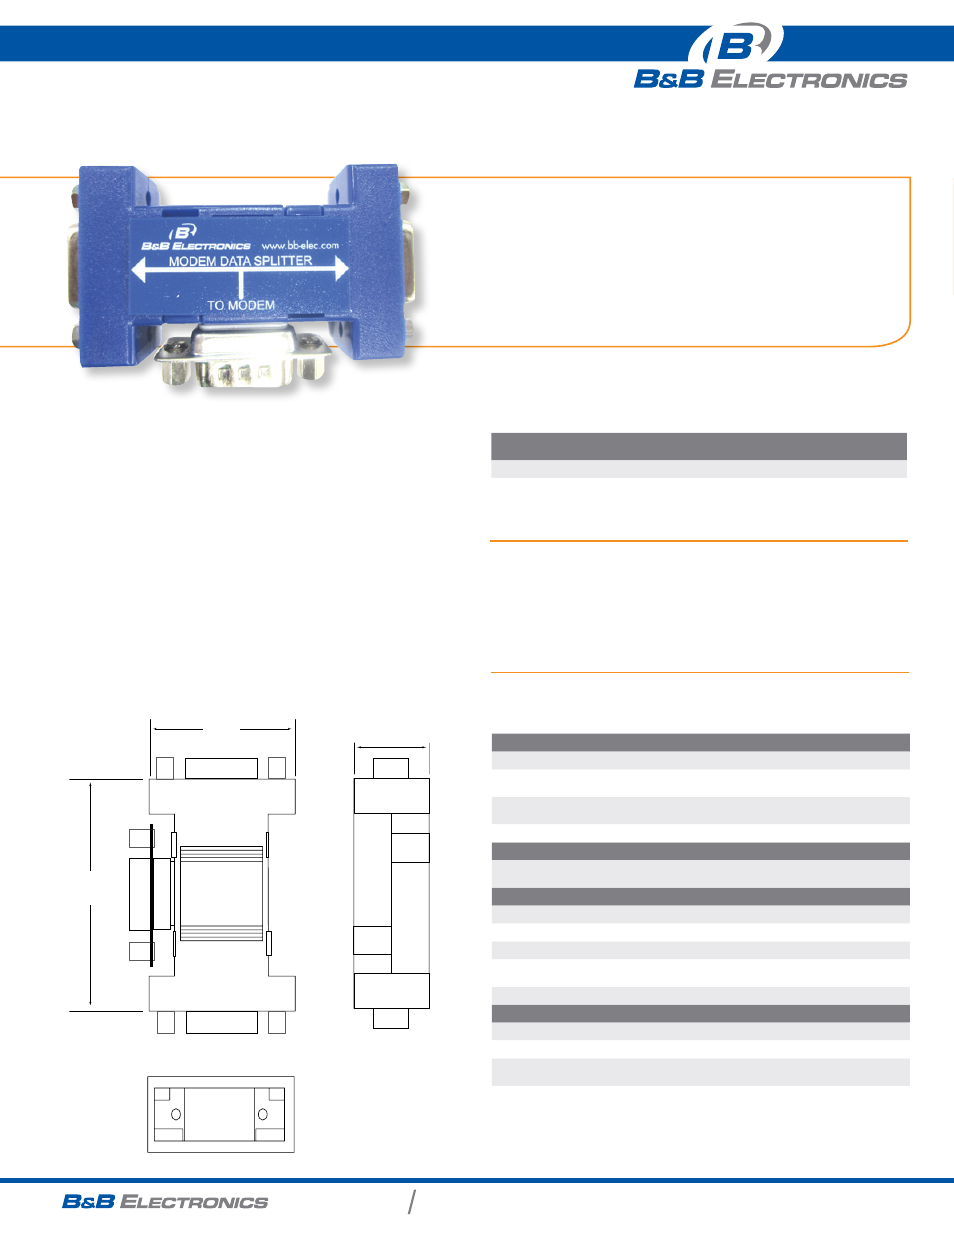 b b electronics 9pmds datasheet user manual 1 page rh manualsdir com Access Data Sheet Data Sheet View